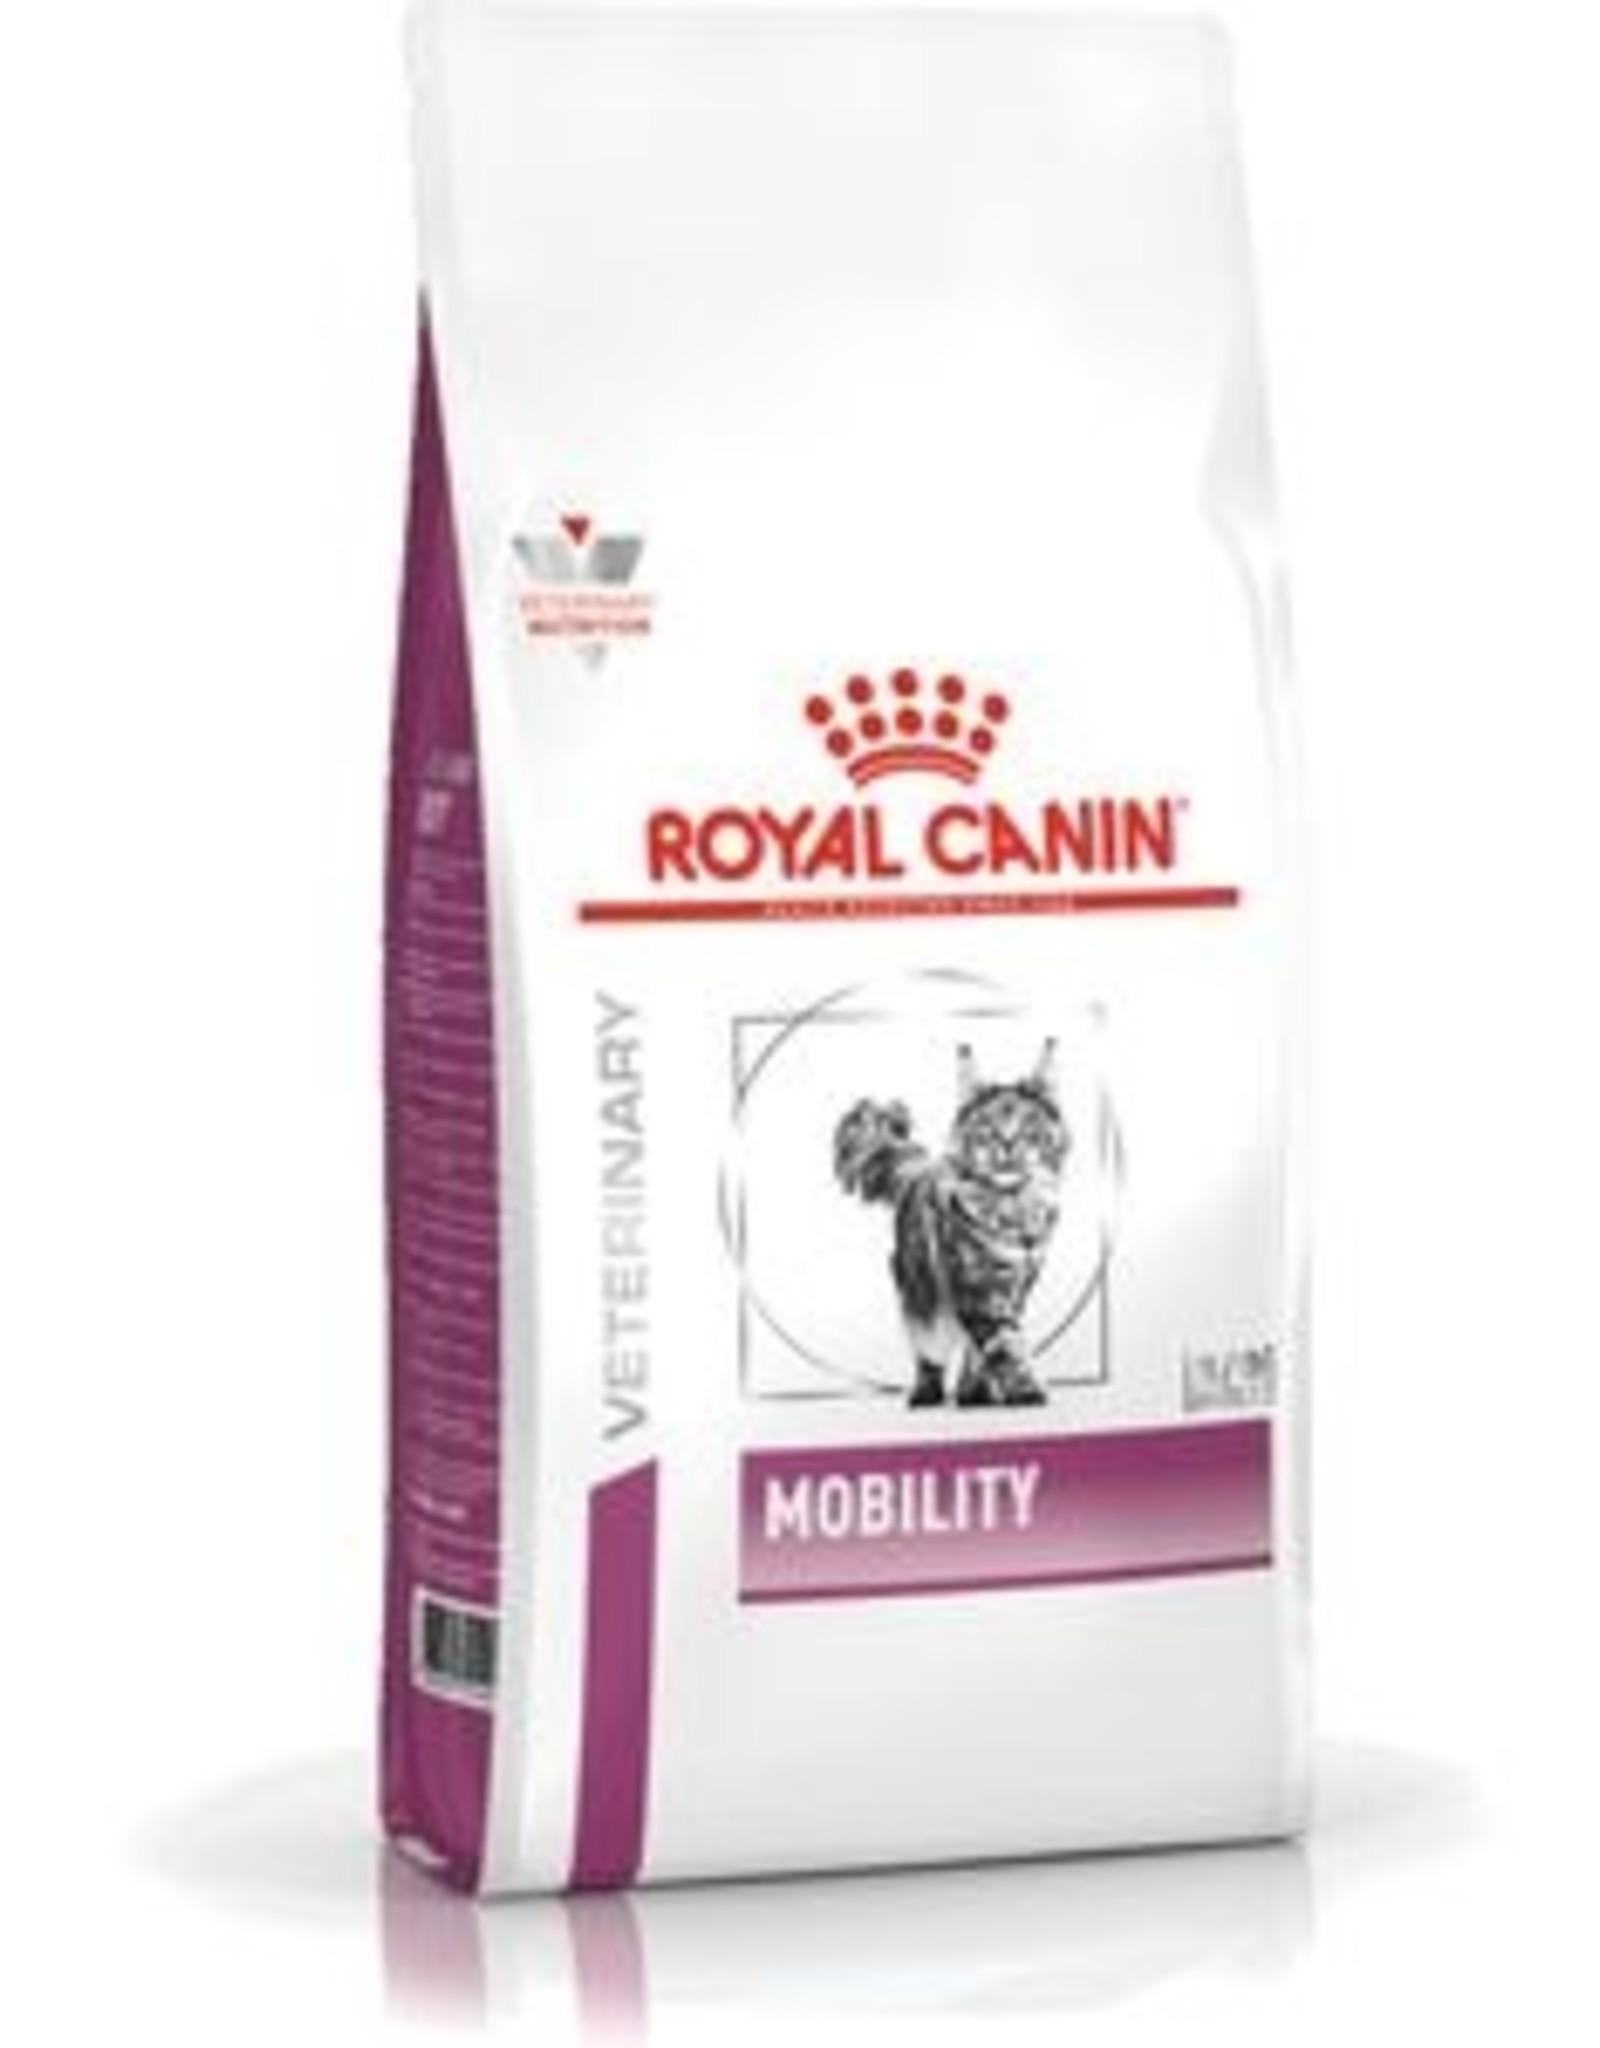 Royal Canin Royal Canin Vdiet Mobility Kat 2kg